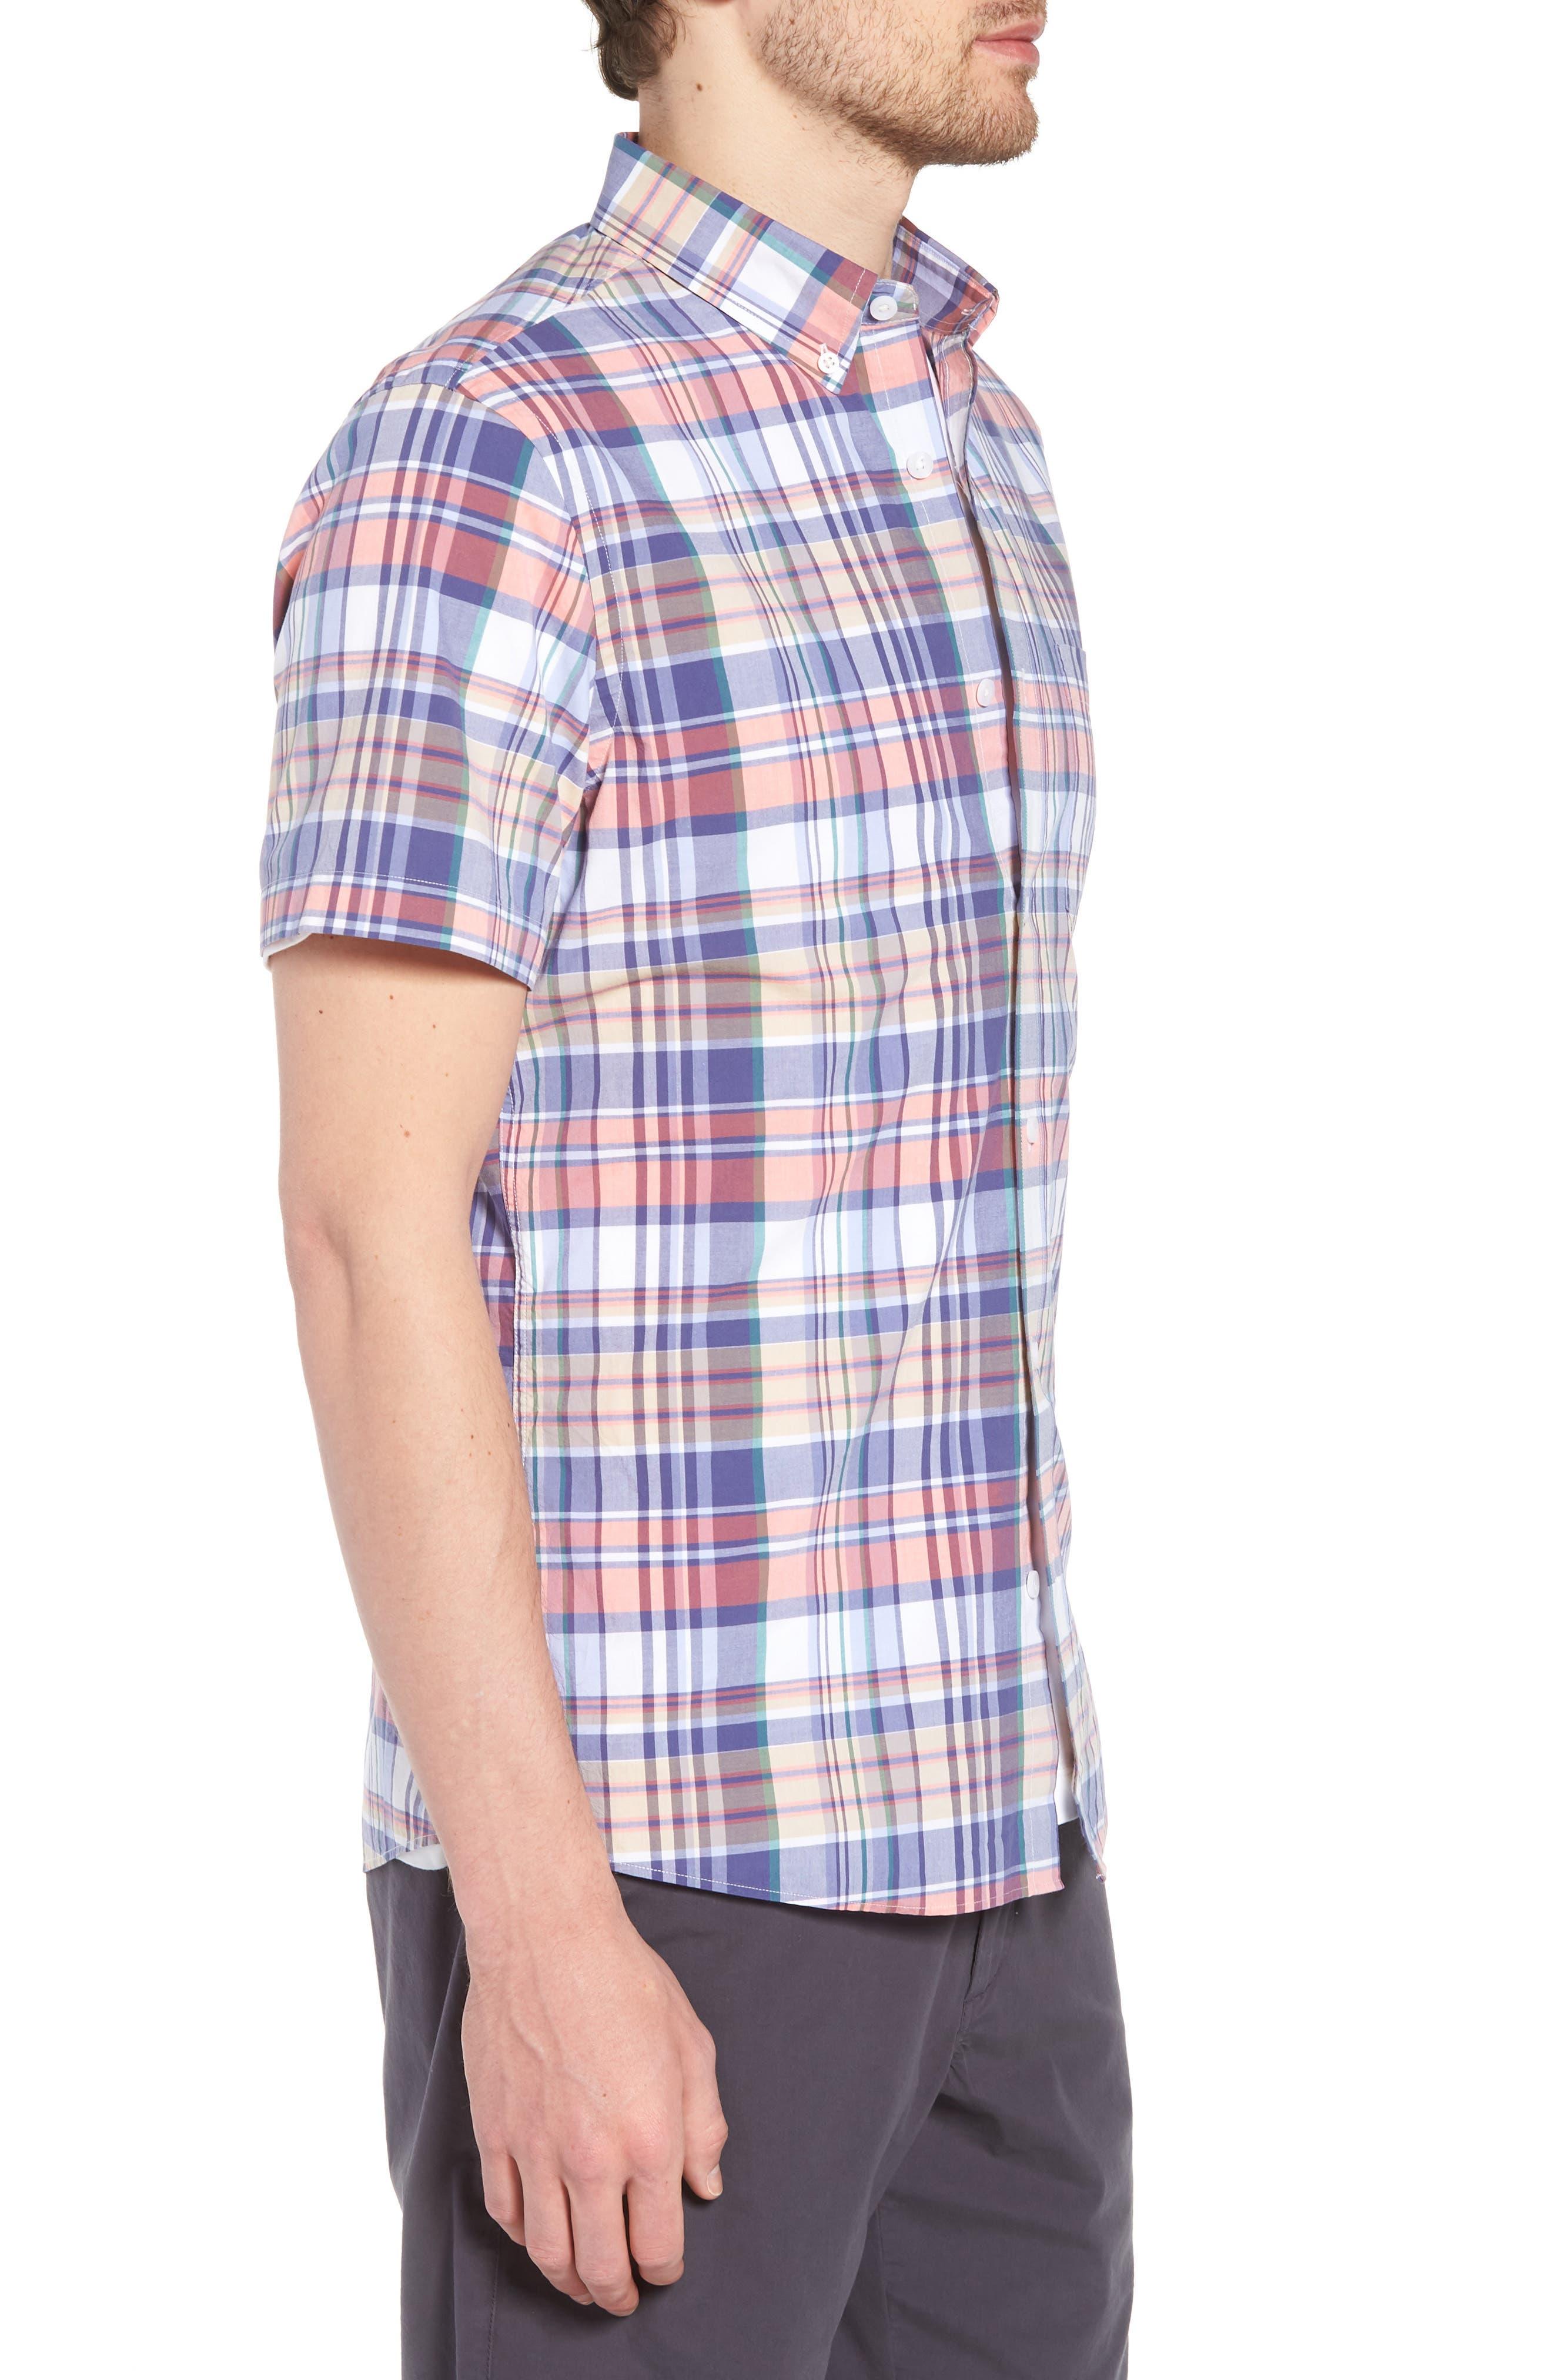 Trim Fit Plaid Short Sleeve Sport Shirt,                             Alternate thumbnail 3, color,                             Navy Coral Multi Plaid